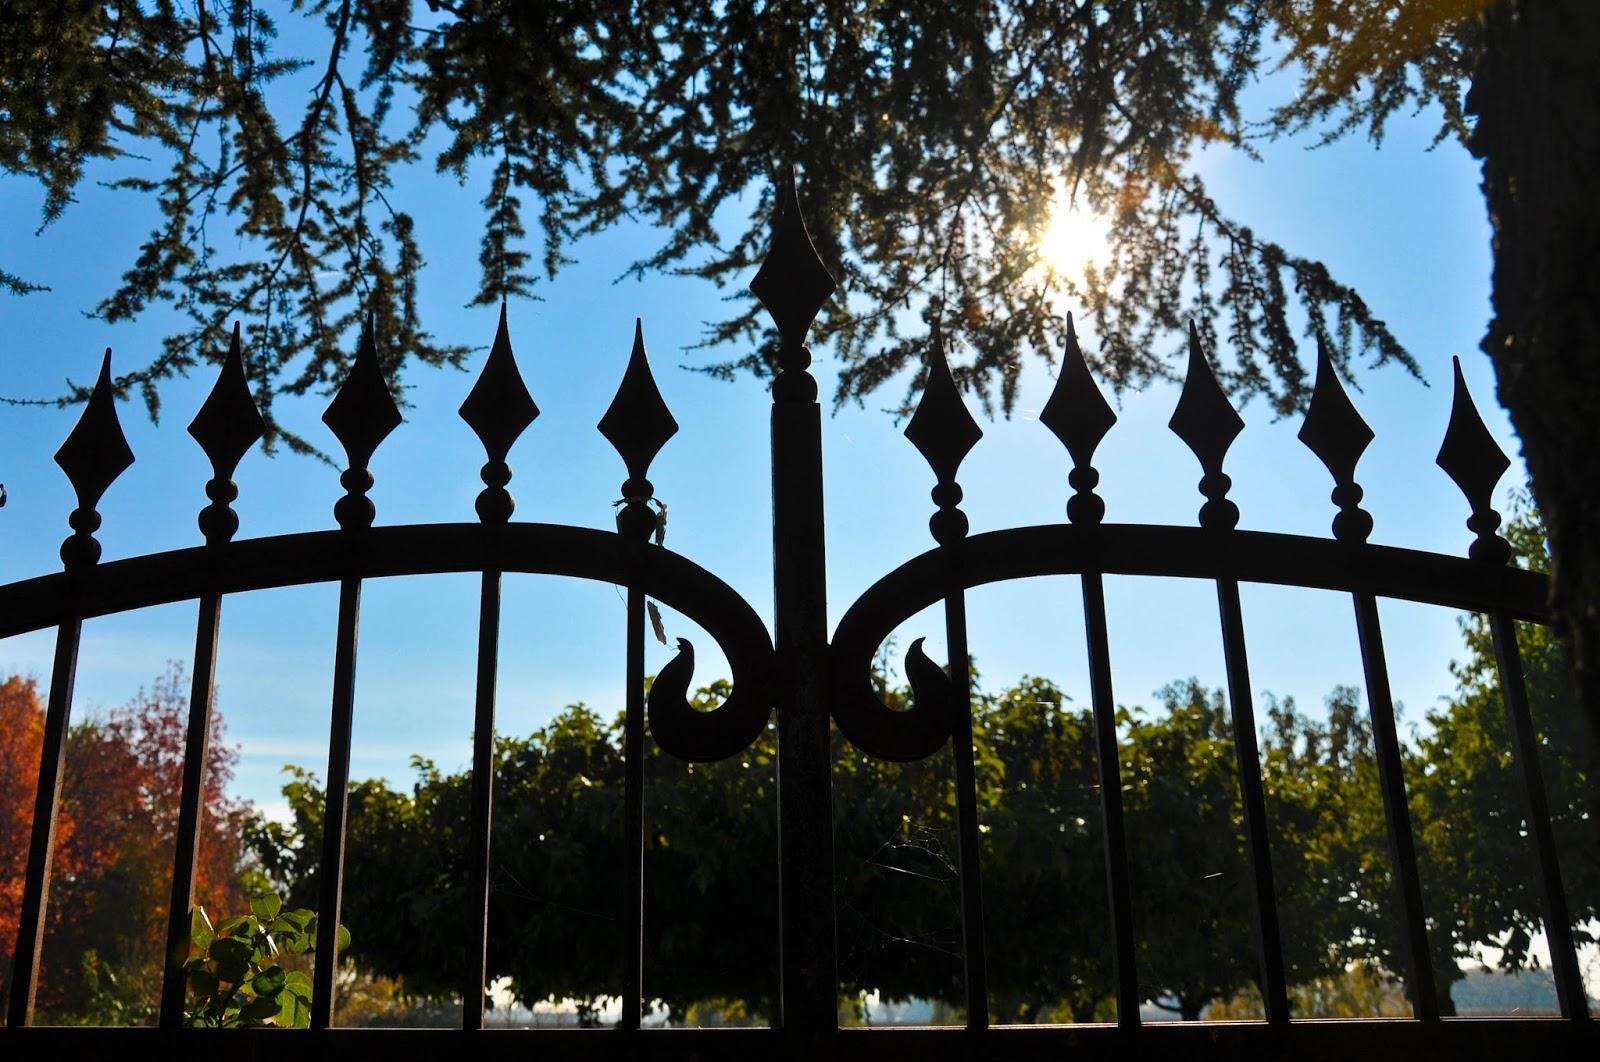 The front fence, Agriturismo La Borina, Veneto, Italy